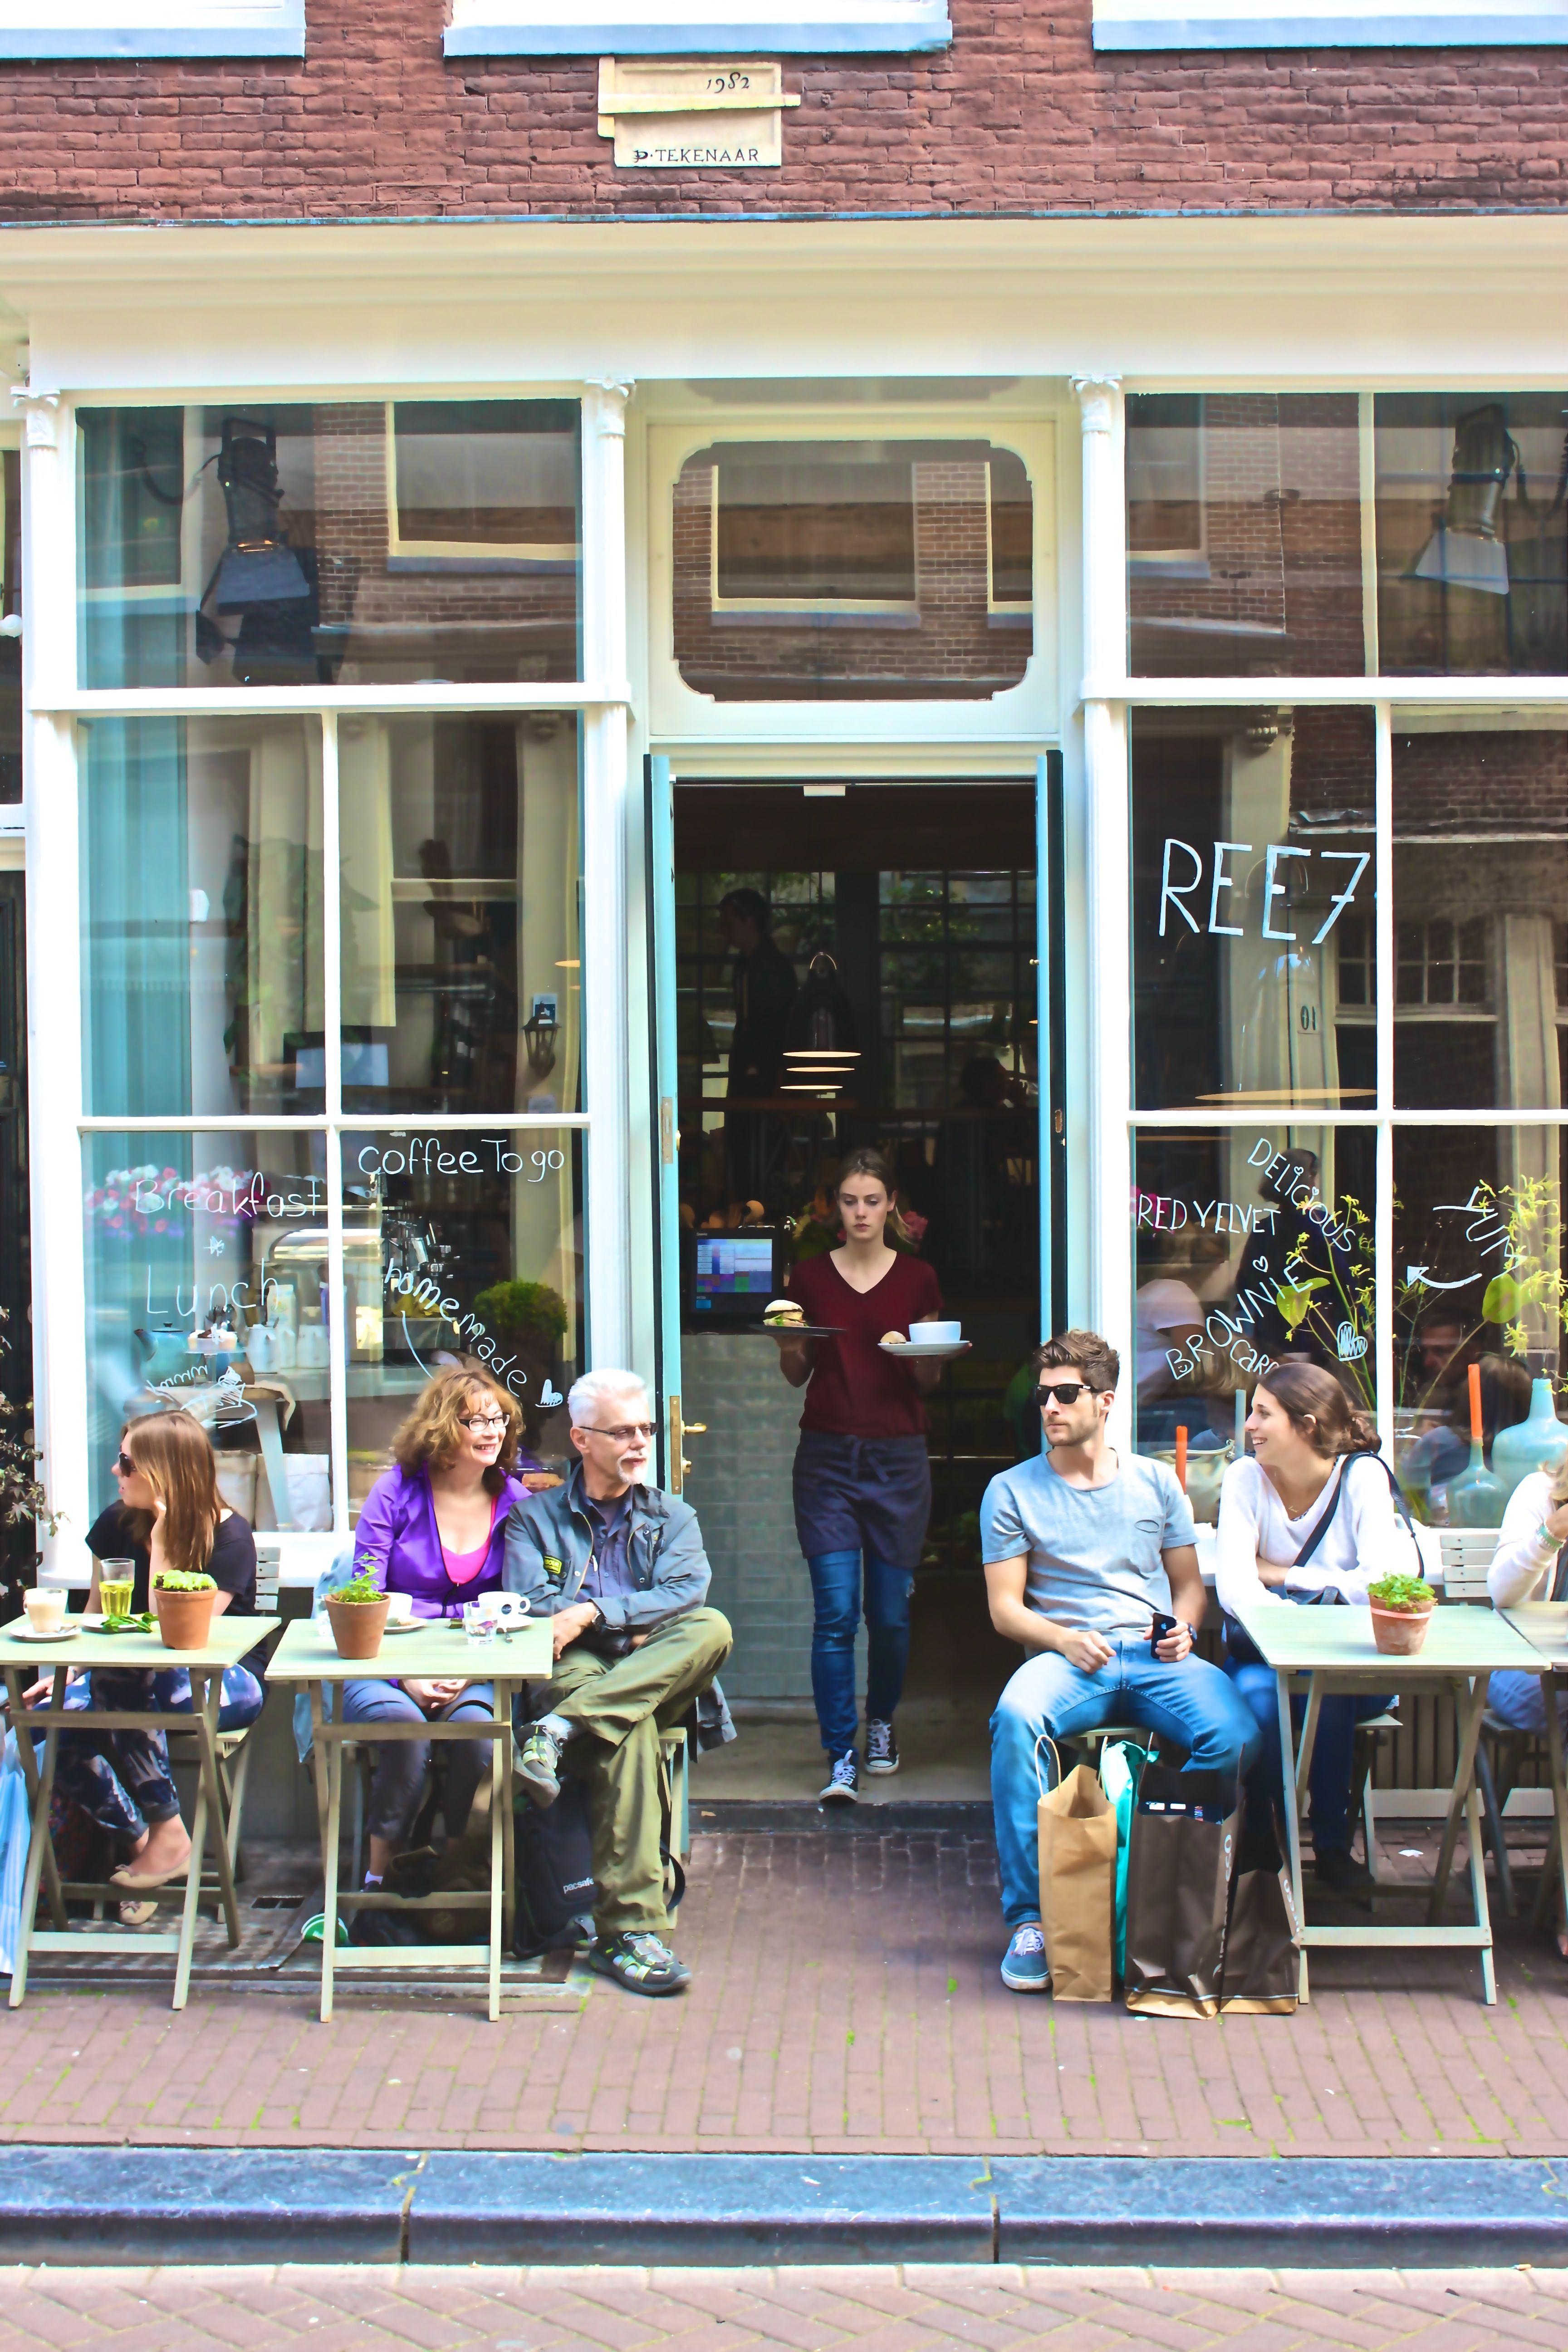 Ree7 Amsterdam Gastrobar Cafe Heaven Http Www Ree7 Nl En Home Bazar Coffee Bistro Restaurant My Coffee Shop Cafe Bistro